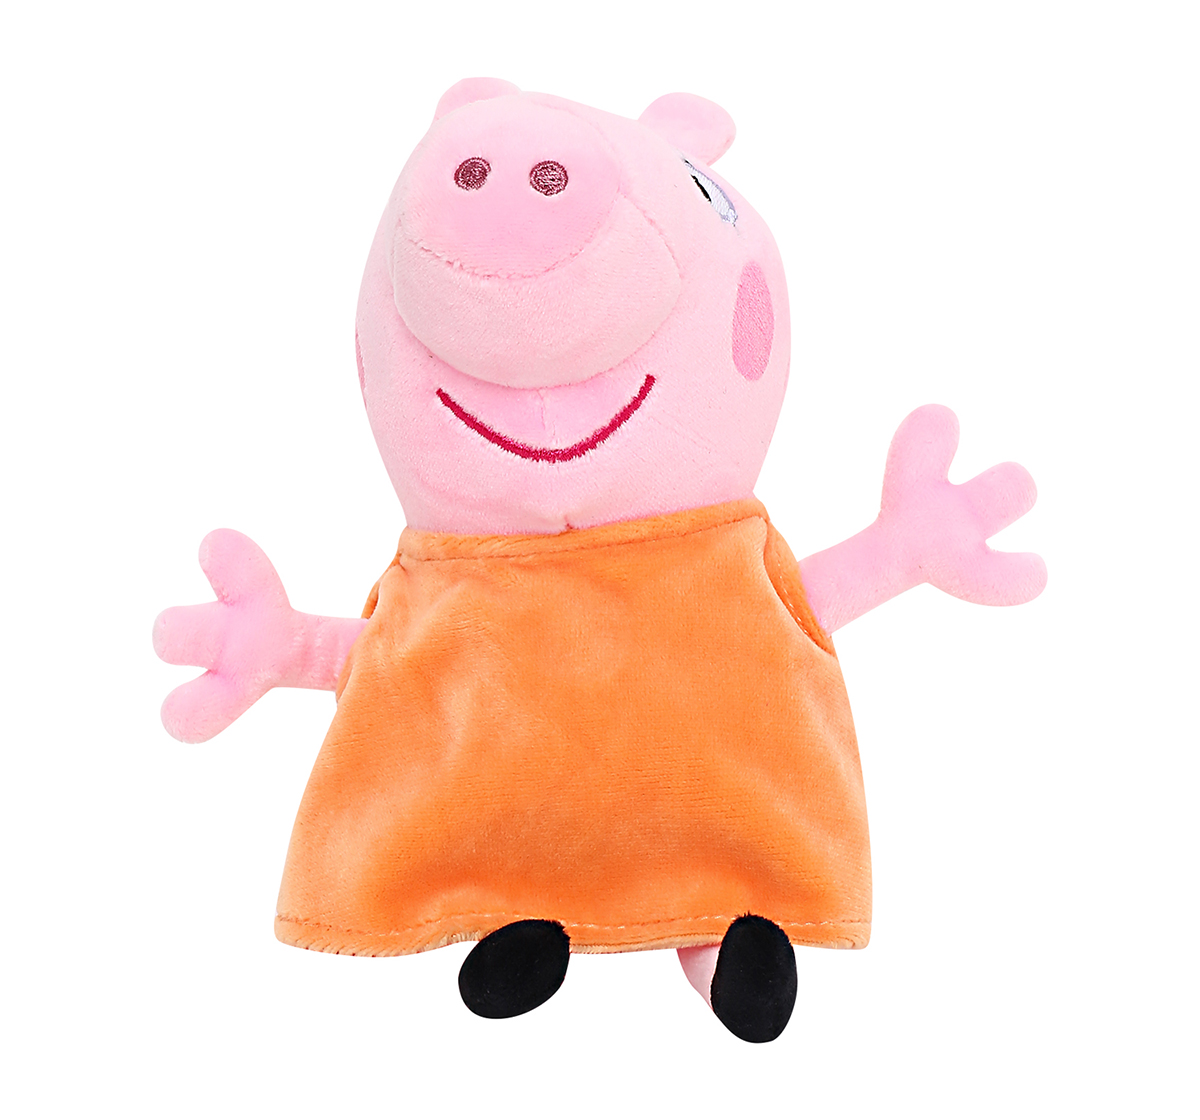 Peppa Pig | Peppa Pig Mummy 19 Cm Soft Toy for Kids age 3Y+ (Pink)